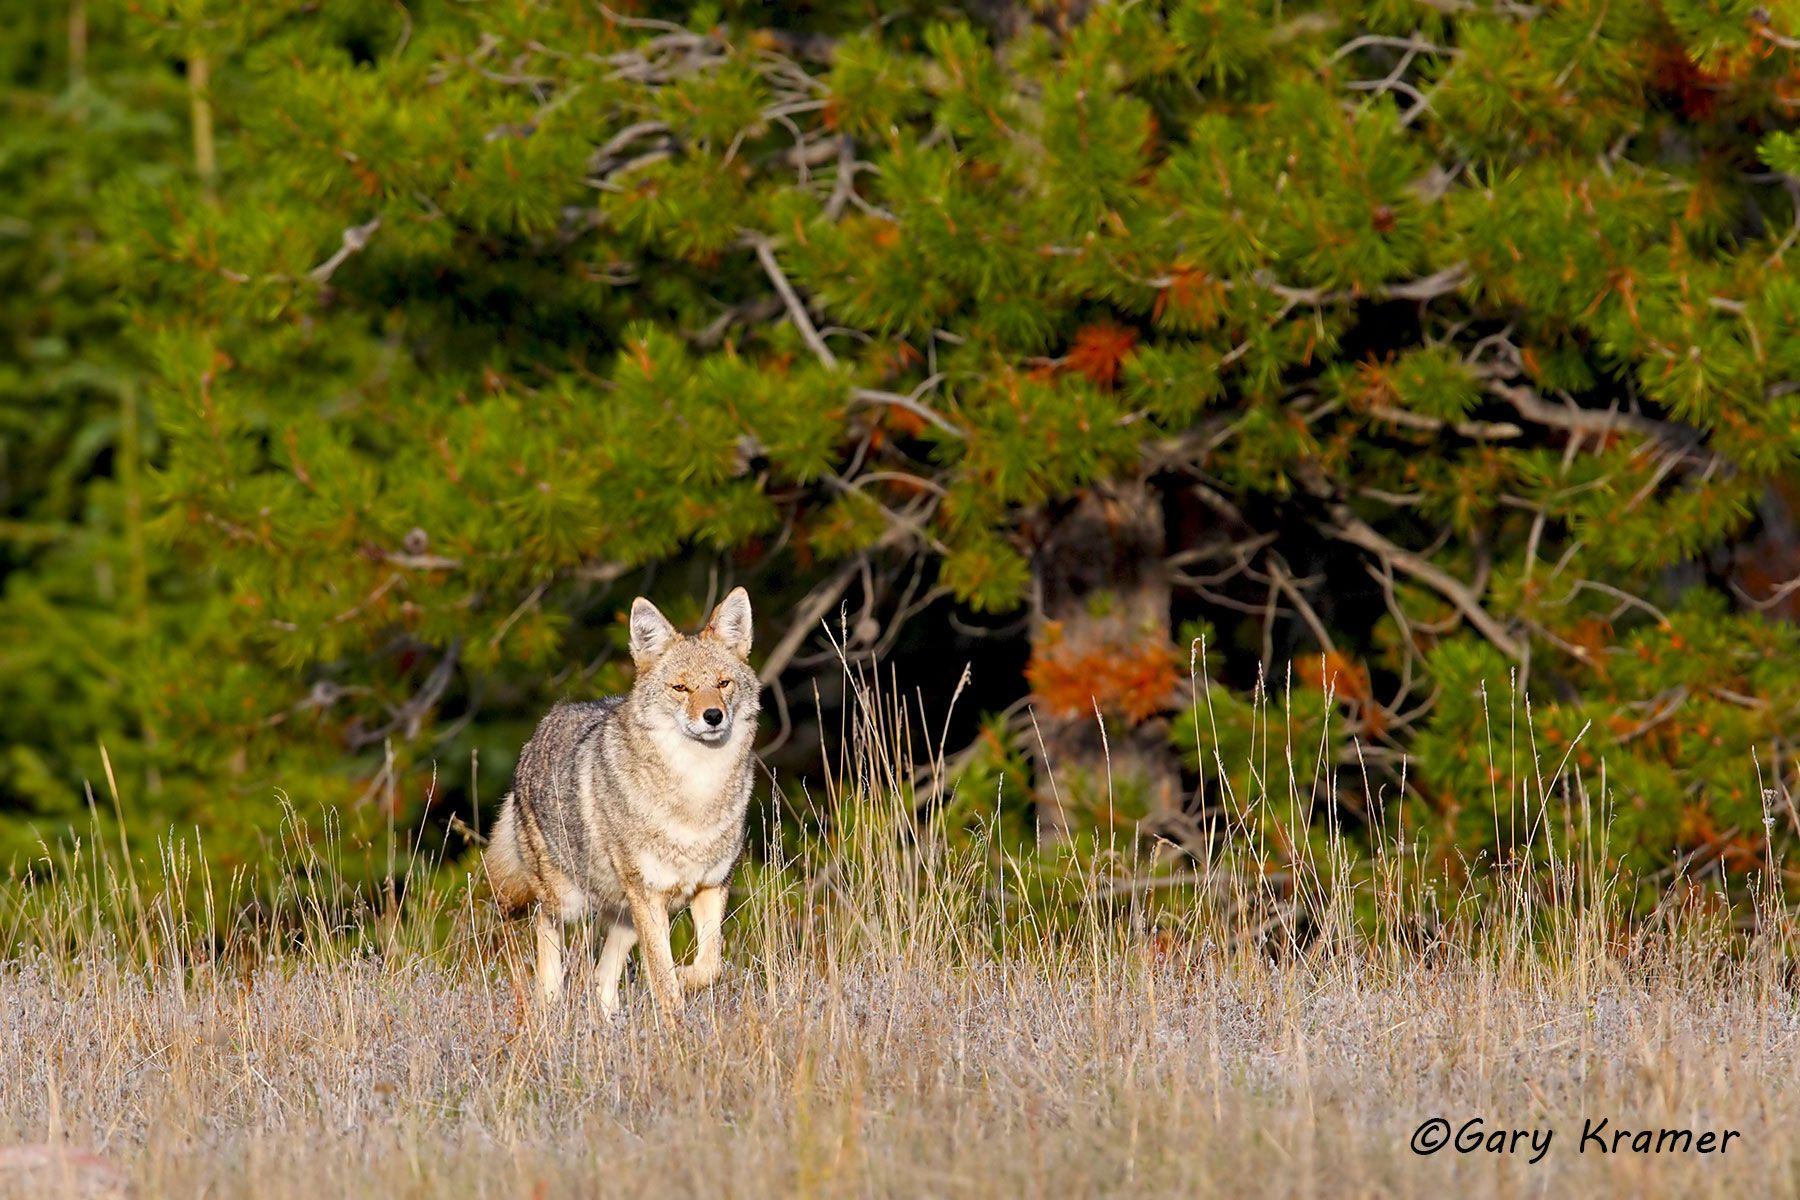 Coyote (Canis latrans) - NMC#1109d